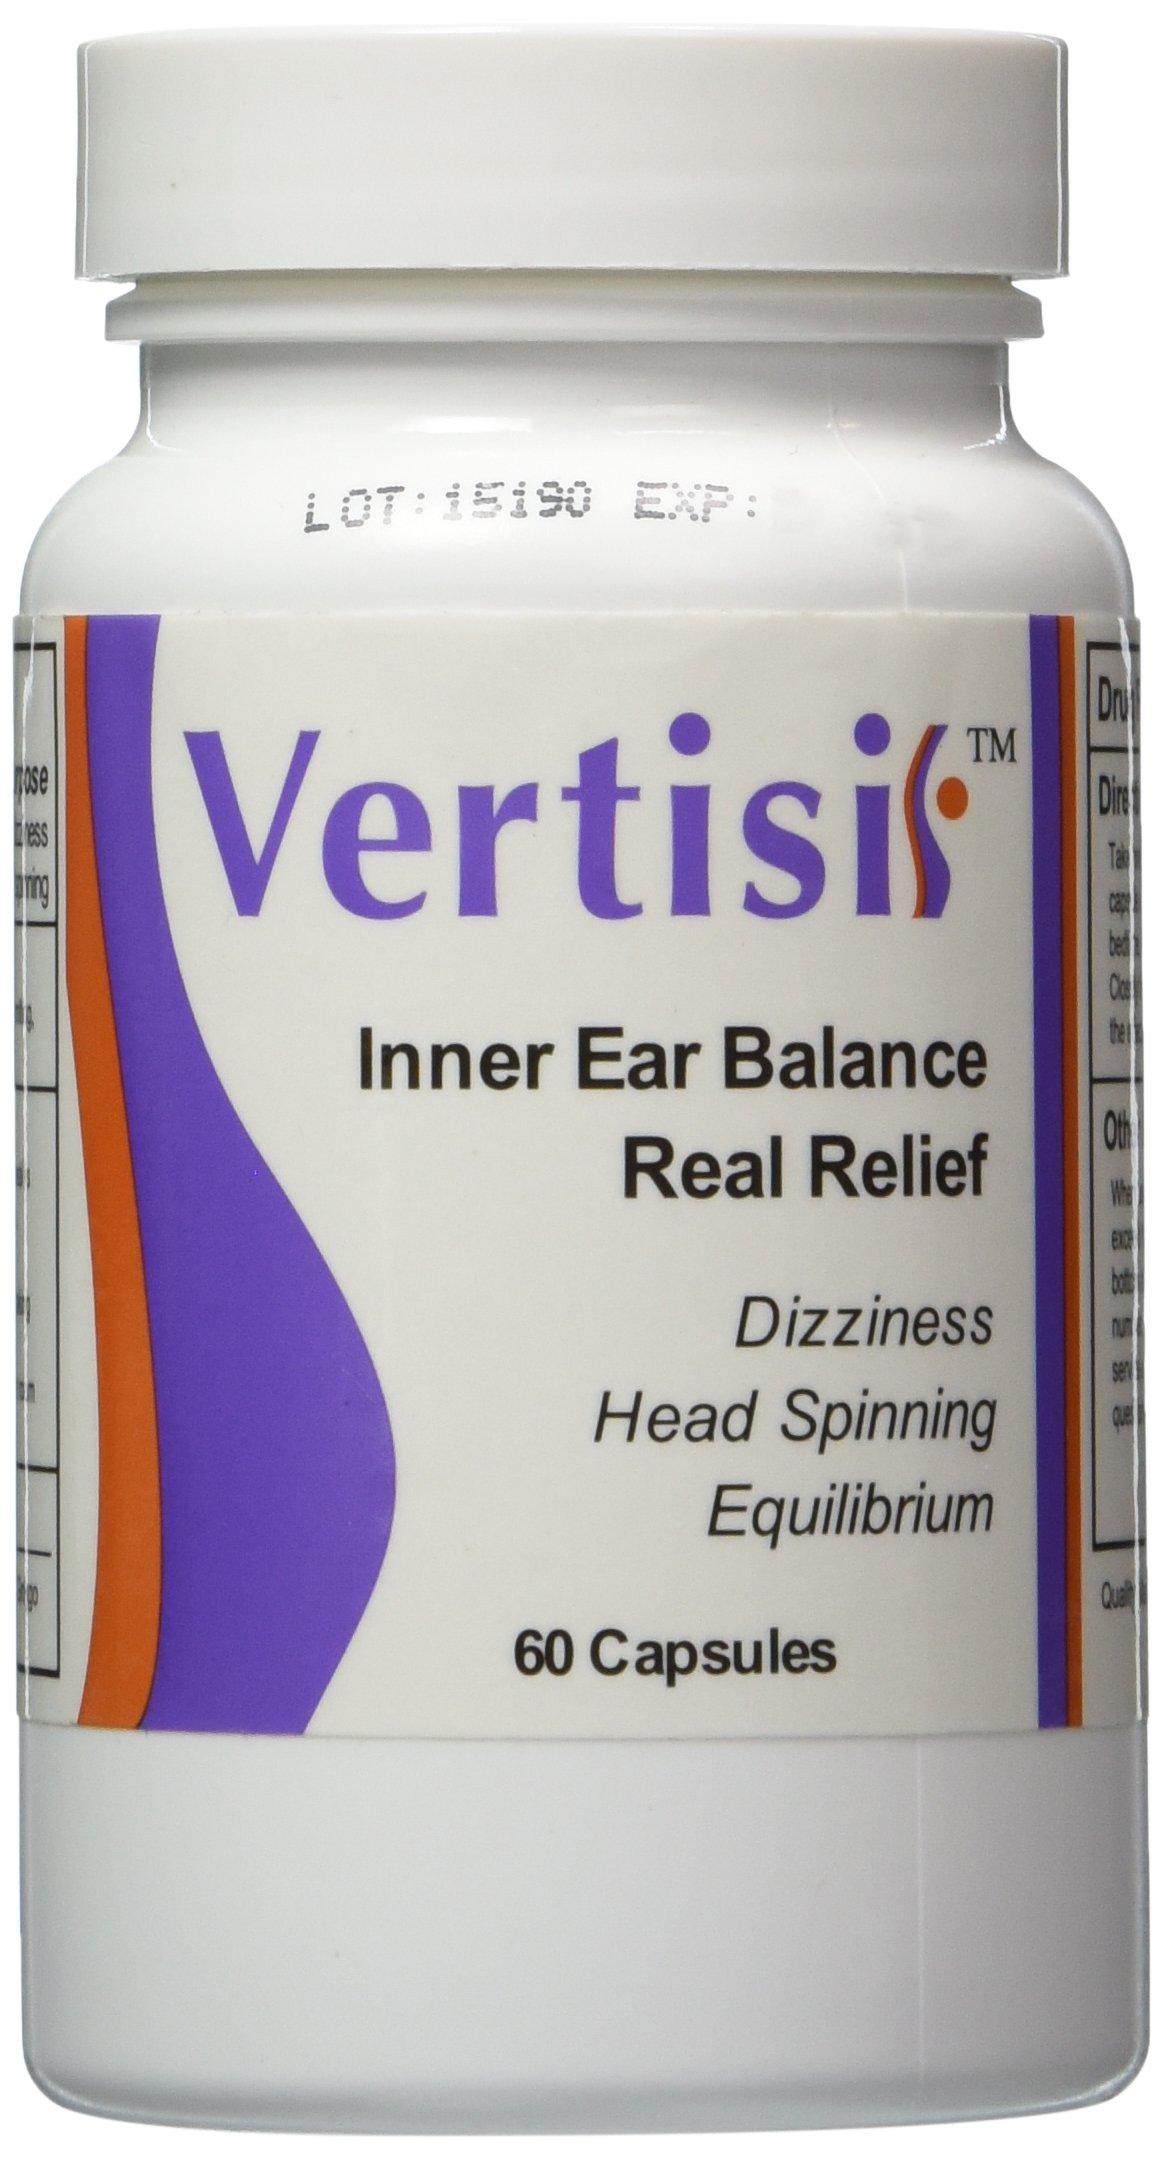 Relieve Vertigo Symptoms including Dizziness, Nausea,Motion Sickness, spinning & swaying sensations with Vertisil. 60 Caps All Natural Ingredients. 100% Lifetime Money Back Guarantee